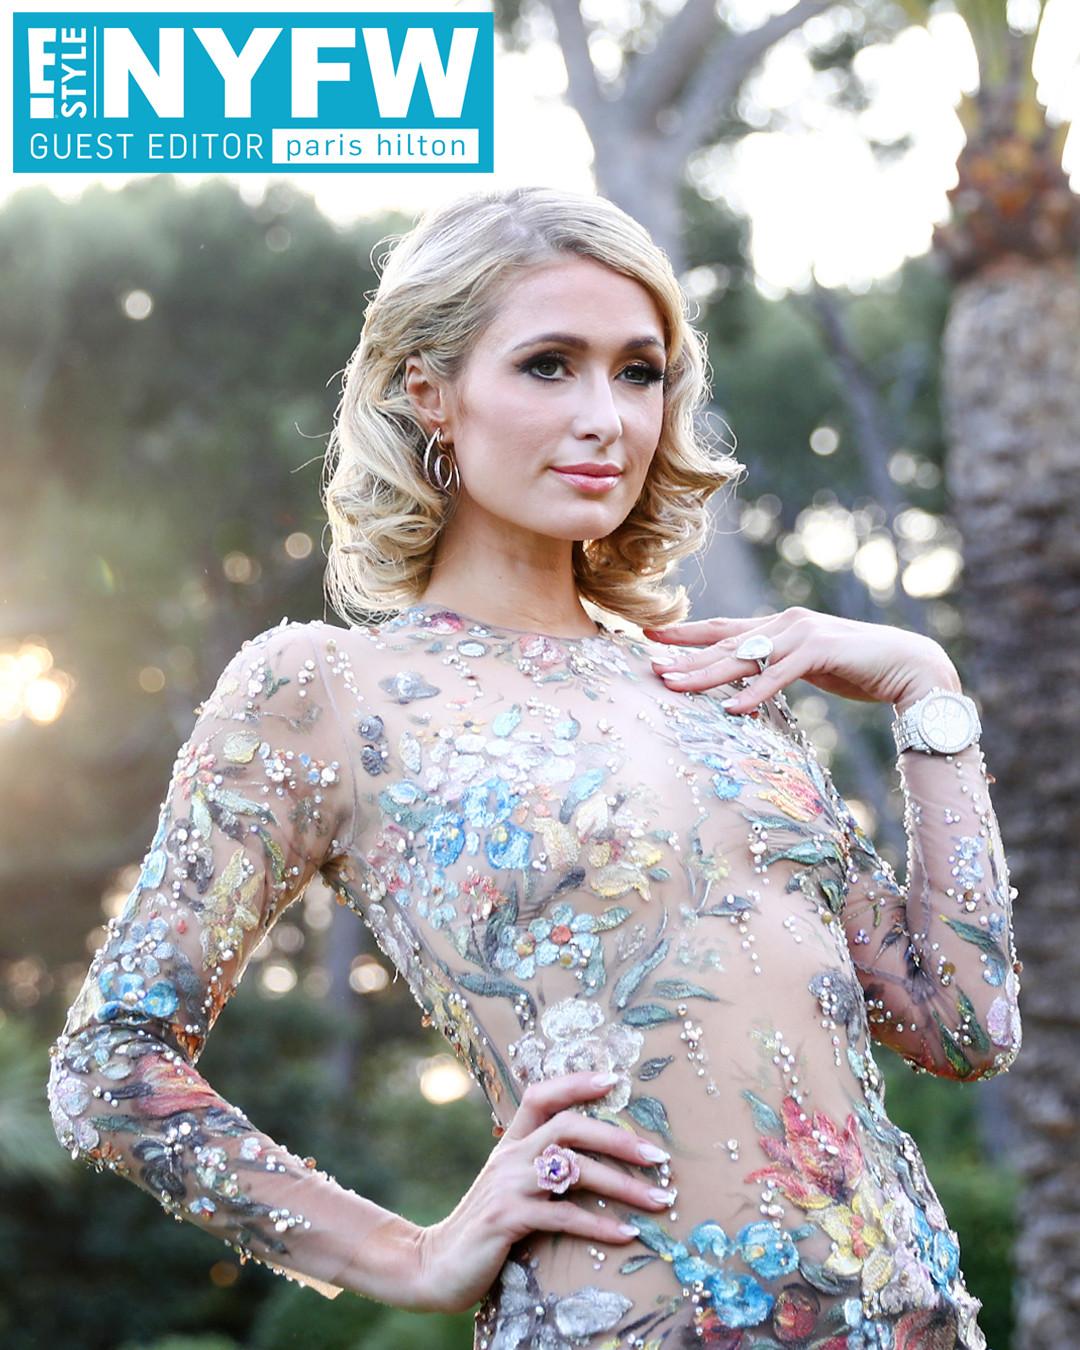 ESC: Guest Editor, Paris Hilton